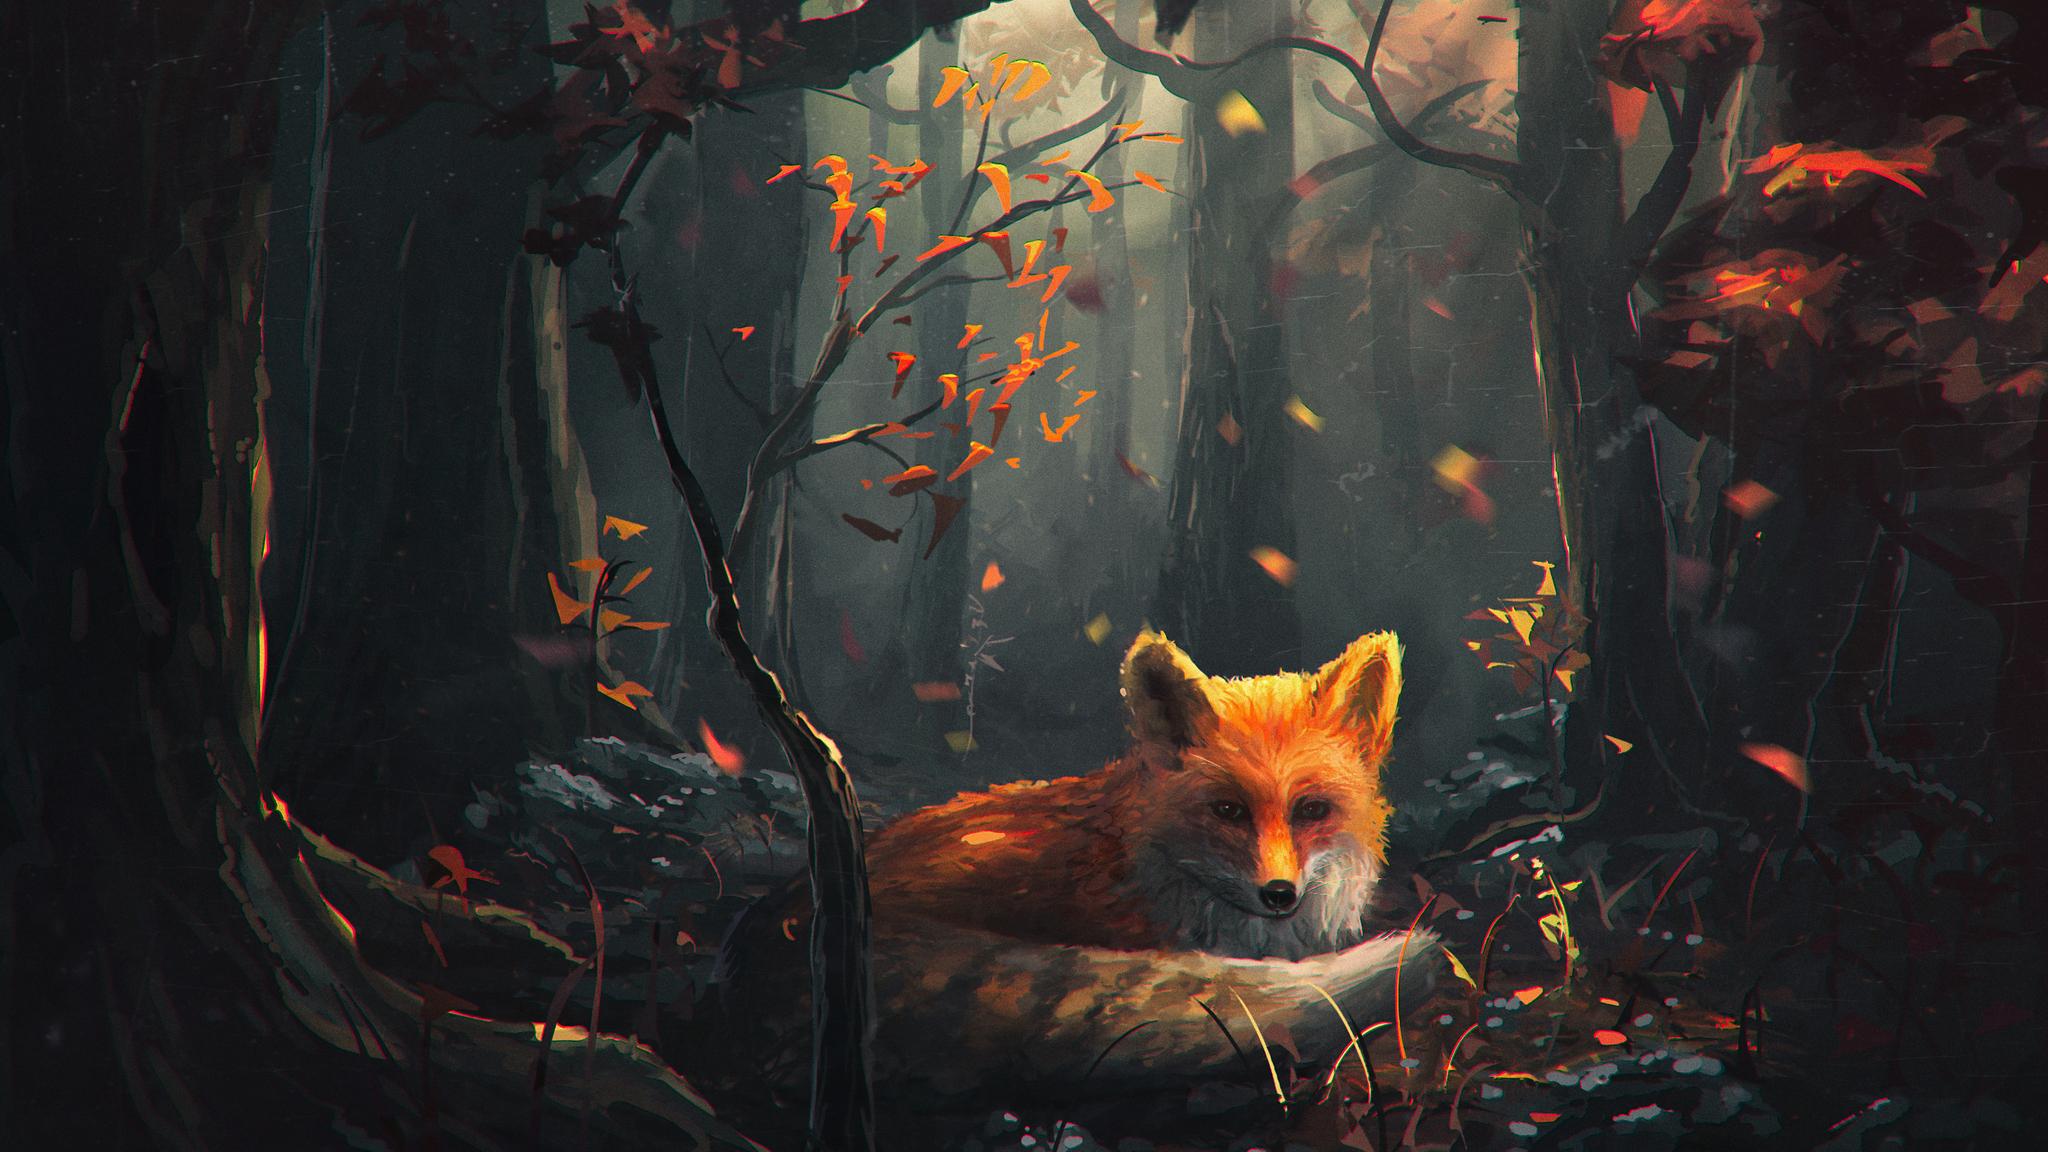 2048x1152 fox art 2048x1152 resolution hd 4k wallpapers